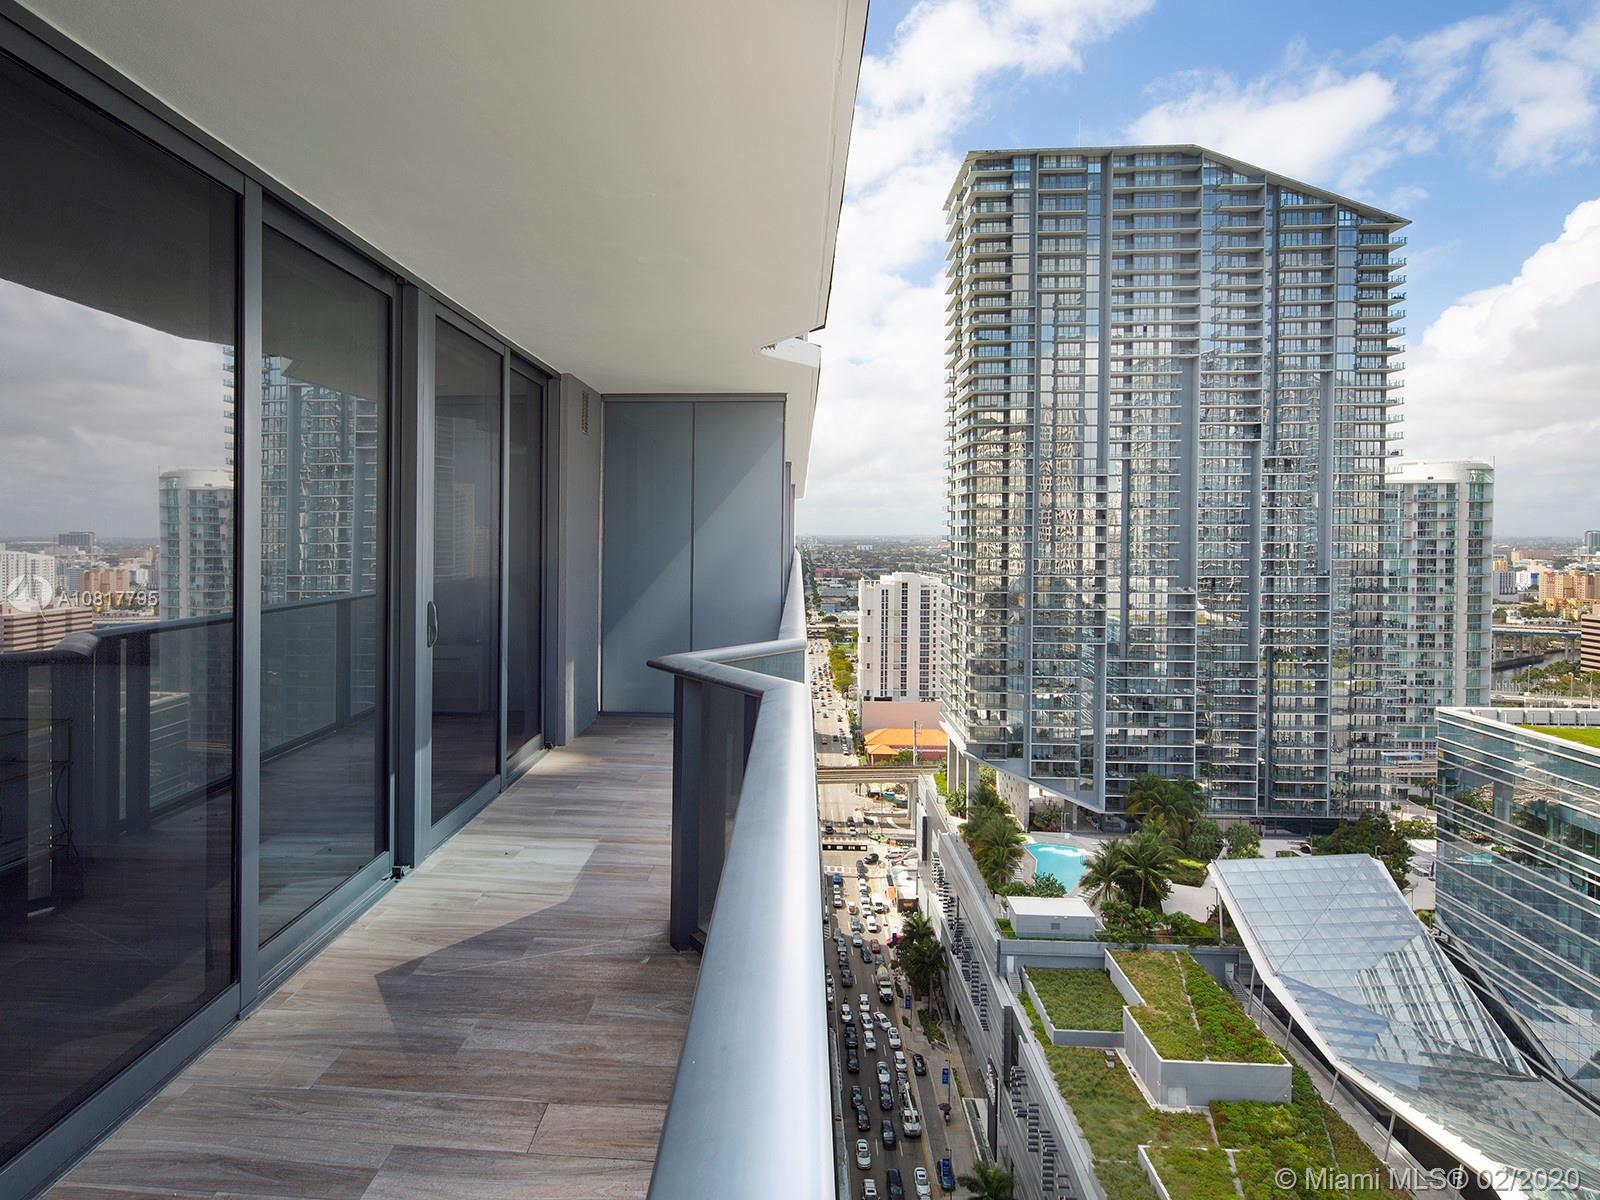 801 S Miami Ave # 2706, Miami, Florida 33130, 1 Bedroom Bedrooms, ,2 BathroomsBathrooms,Residential,For Sale,801 S Miami Ave # 2706,A10817795